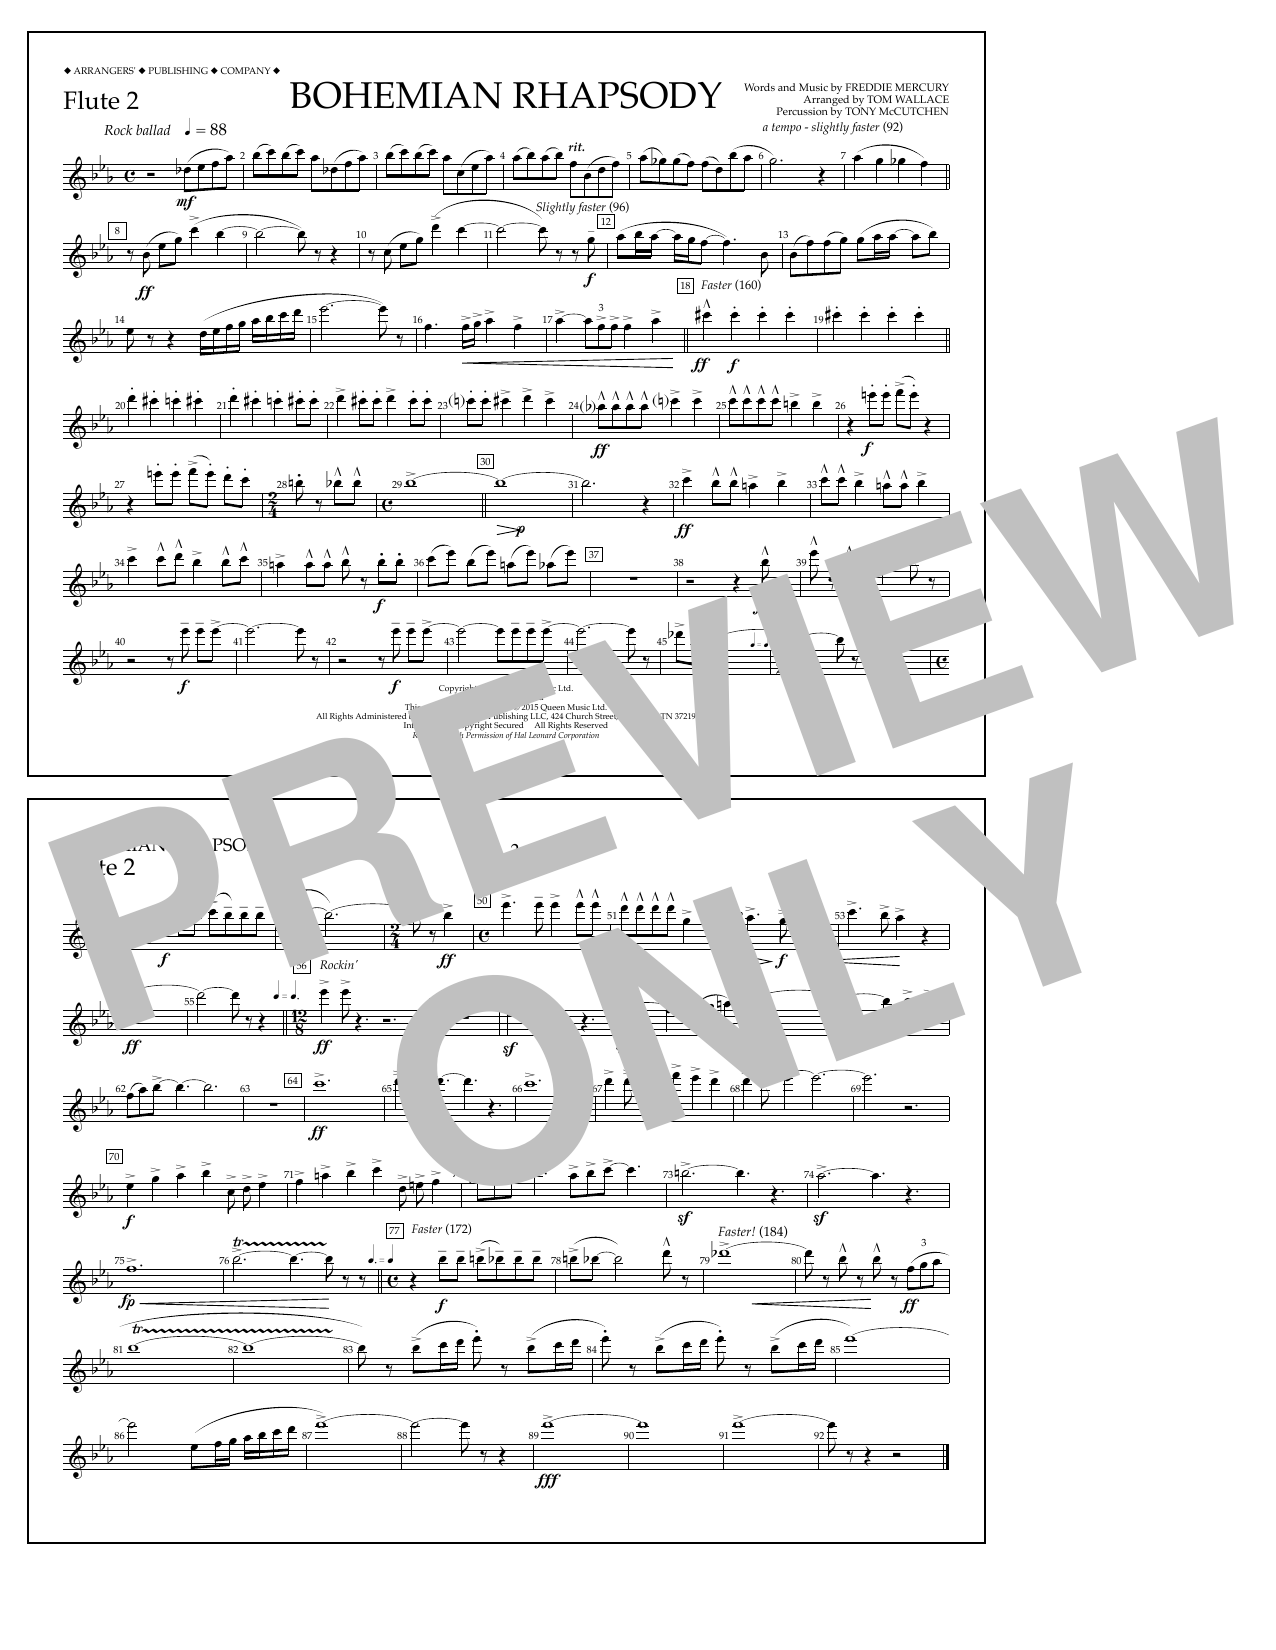 Bohemian Rhapsody - Flute 2 (Marching Band)